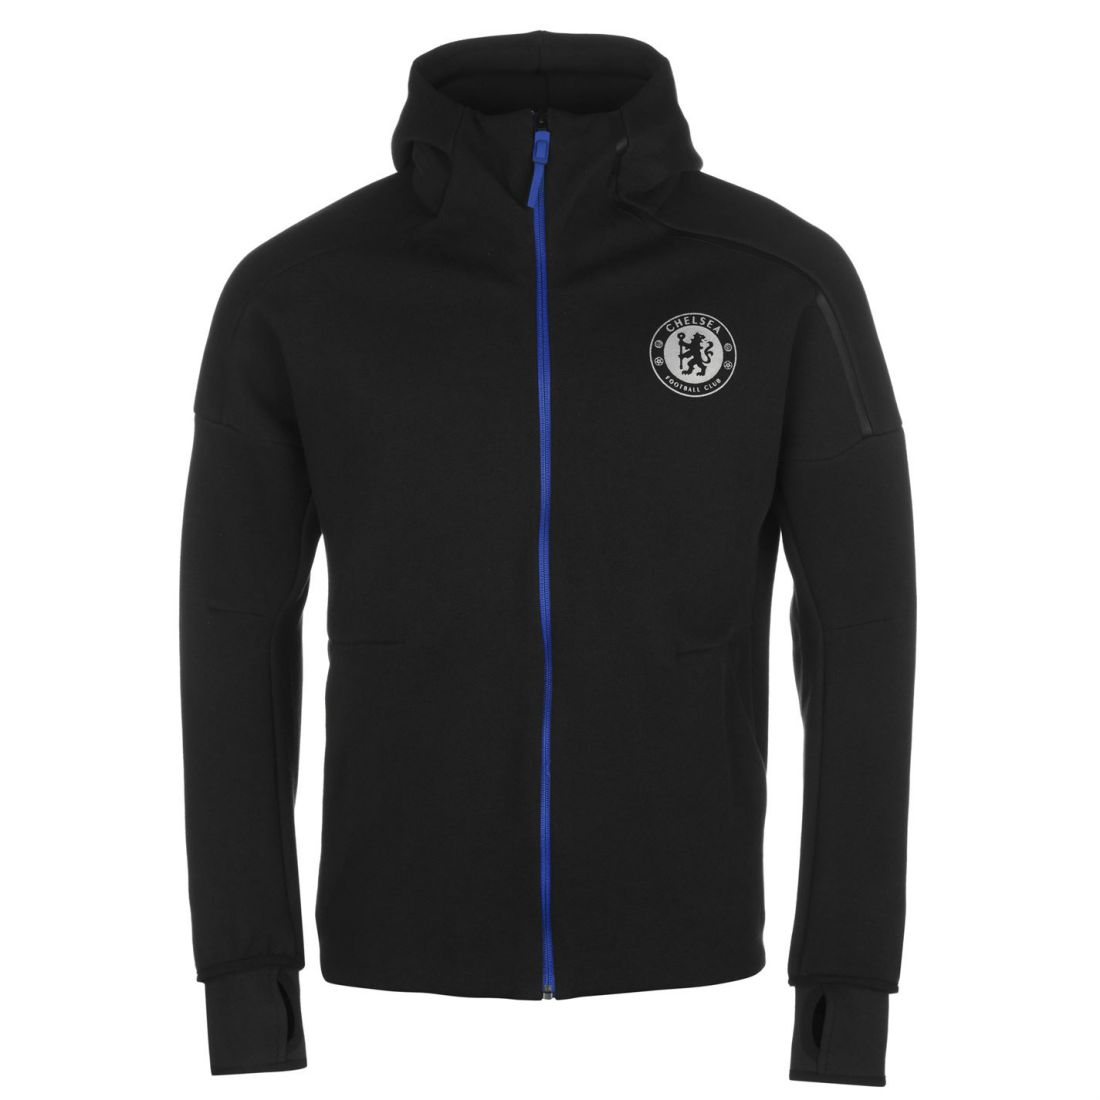 Details about adidas Mens Chelsea Football Club ZNE Hoody Zip Hoodie Hooded Top High Neck Full